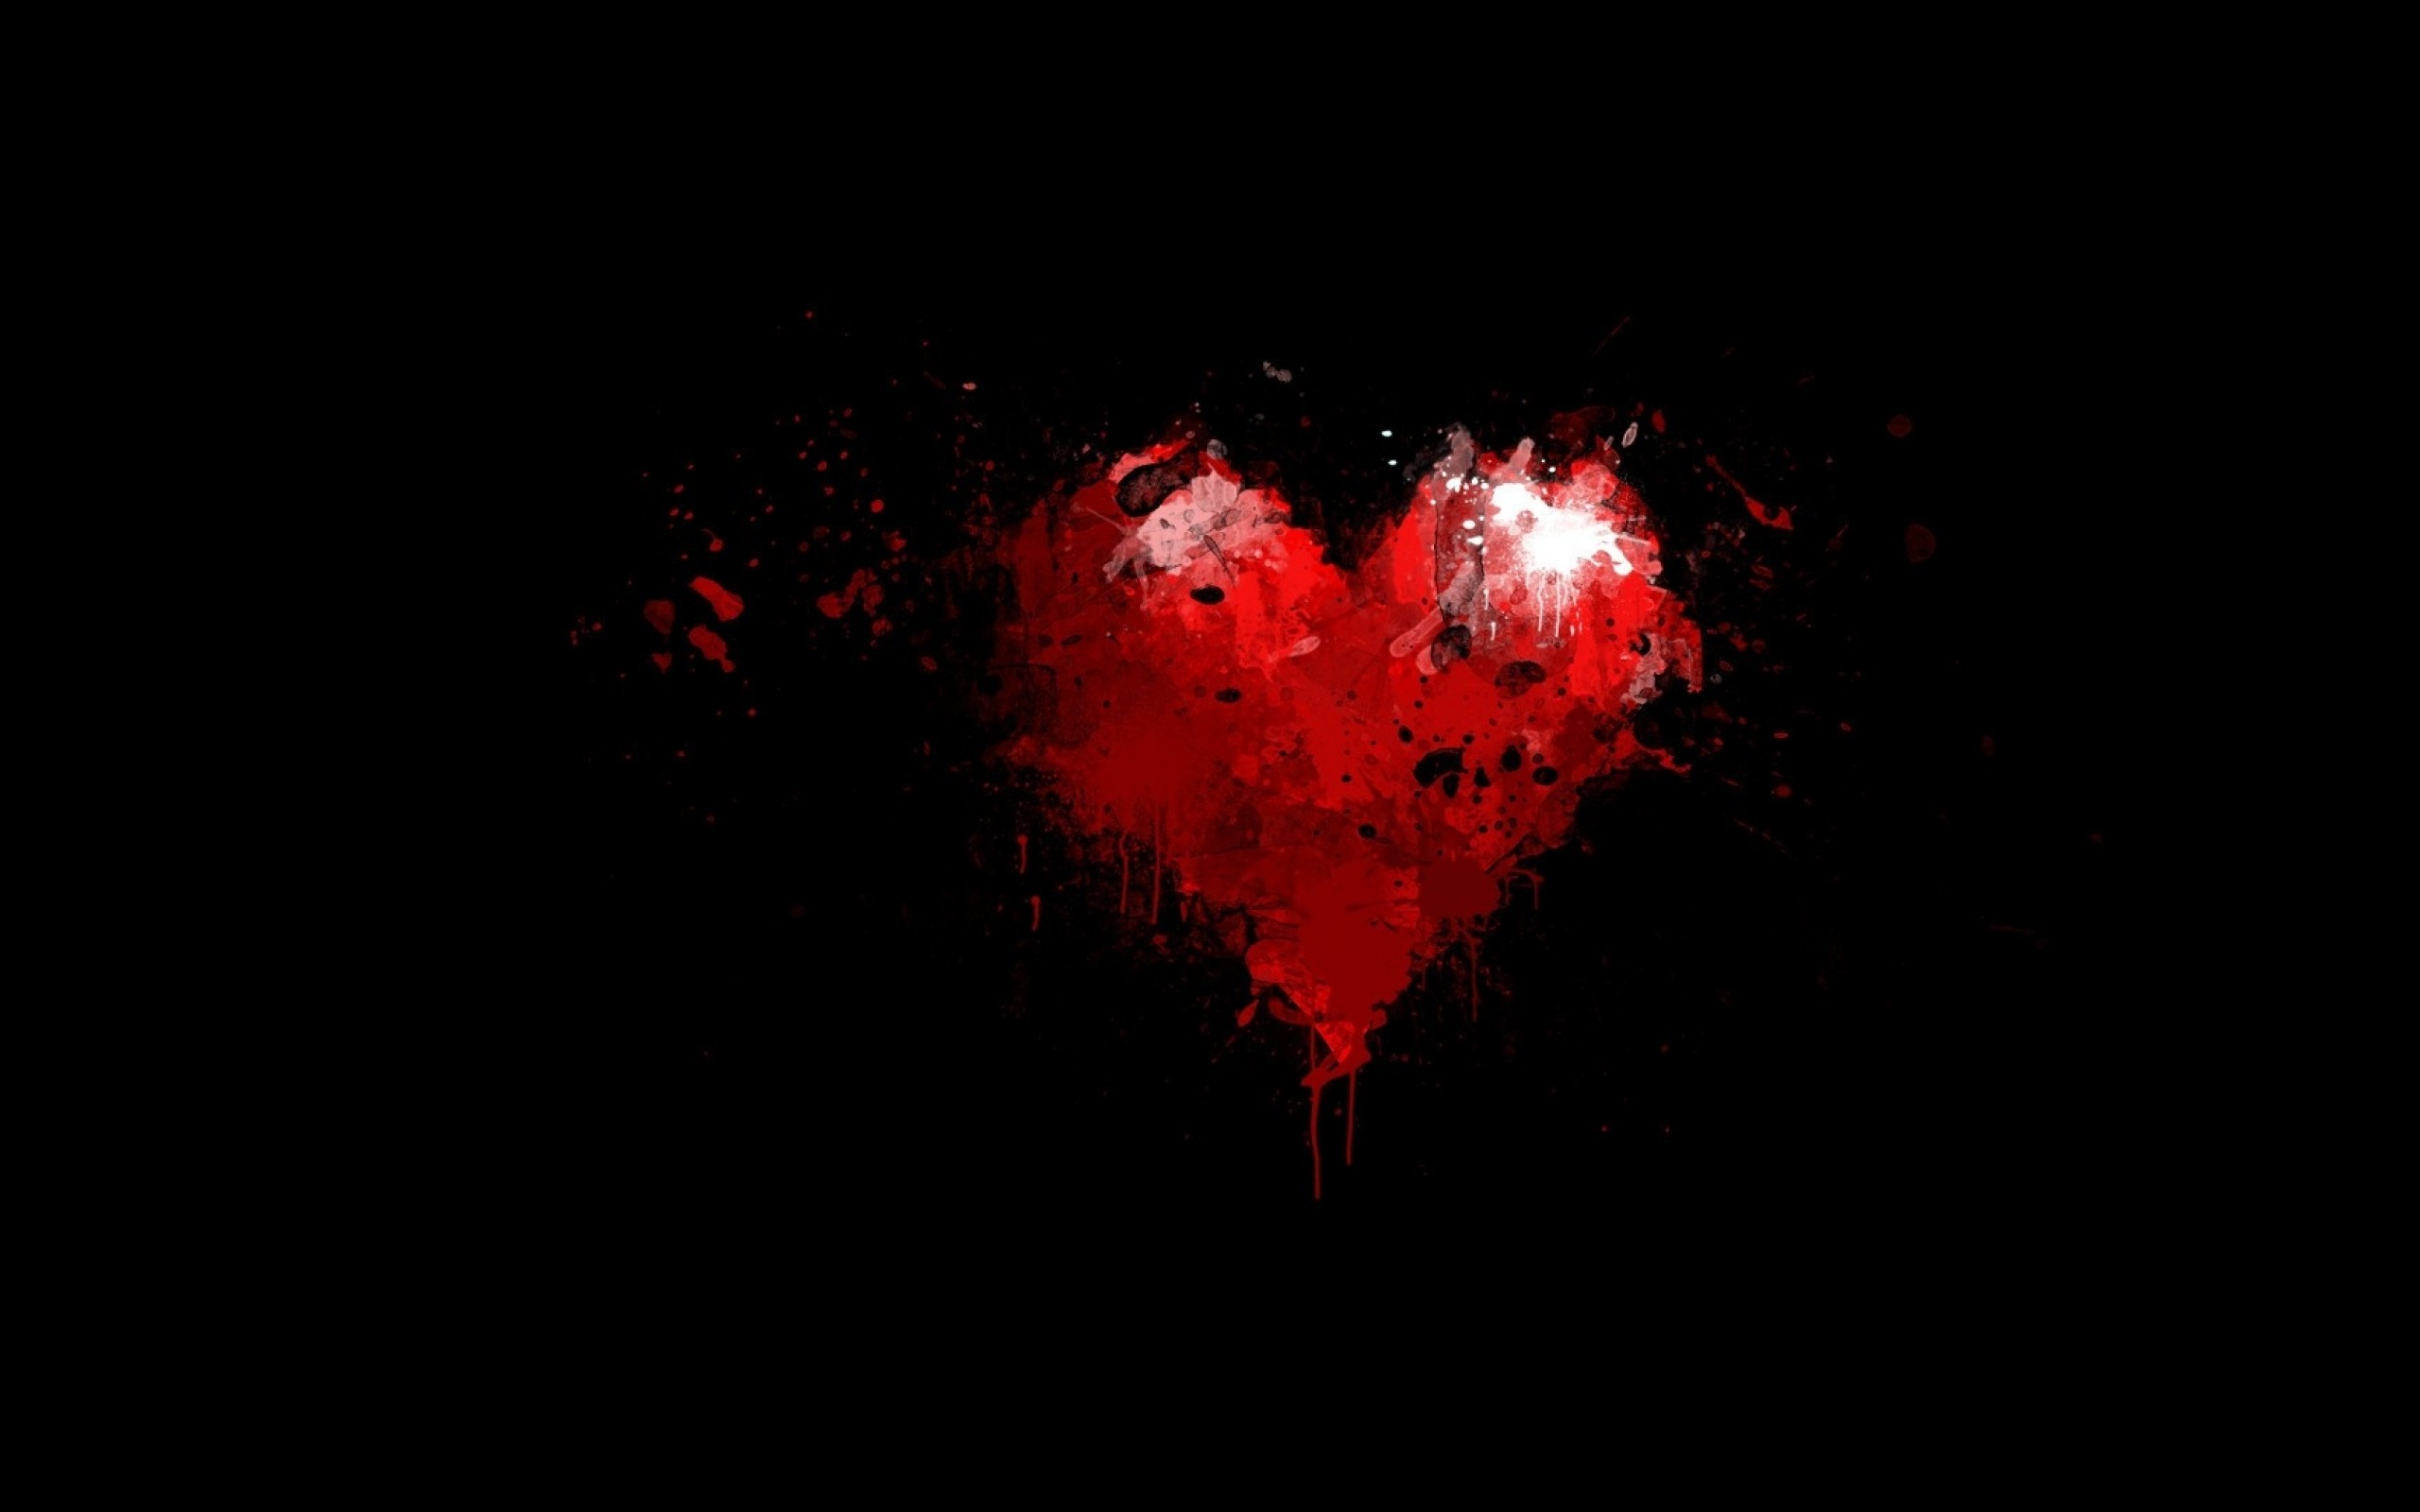 Boy Broken Heart Wallpaper Hd I Hate You Wallpapers Images